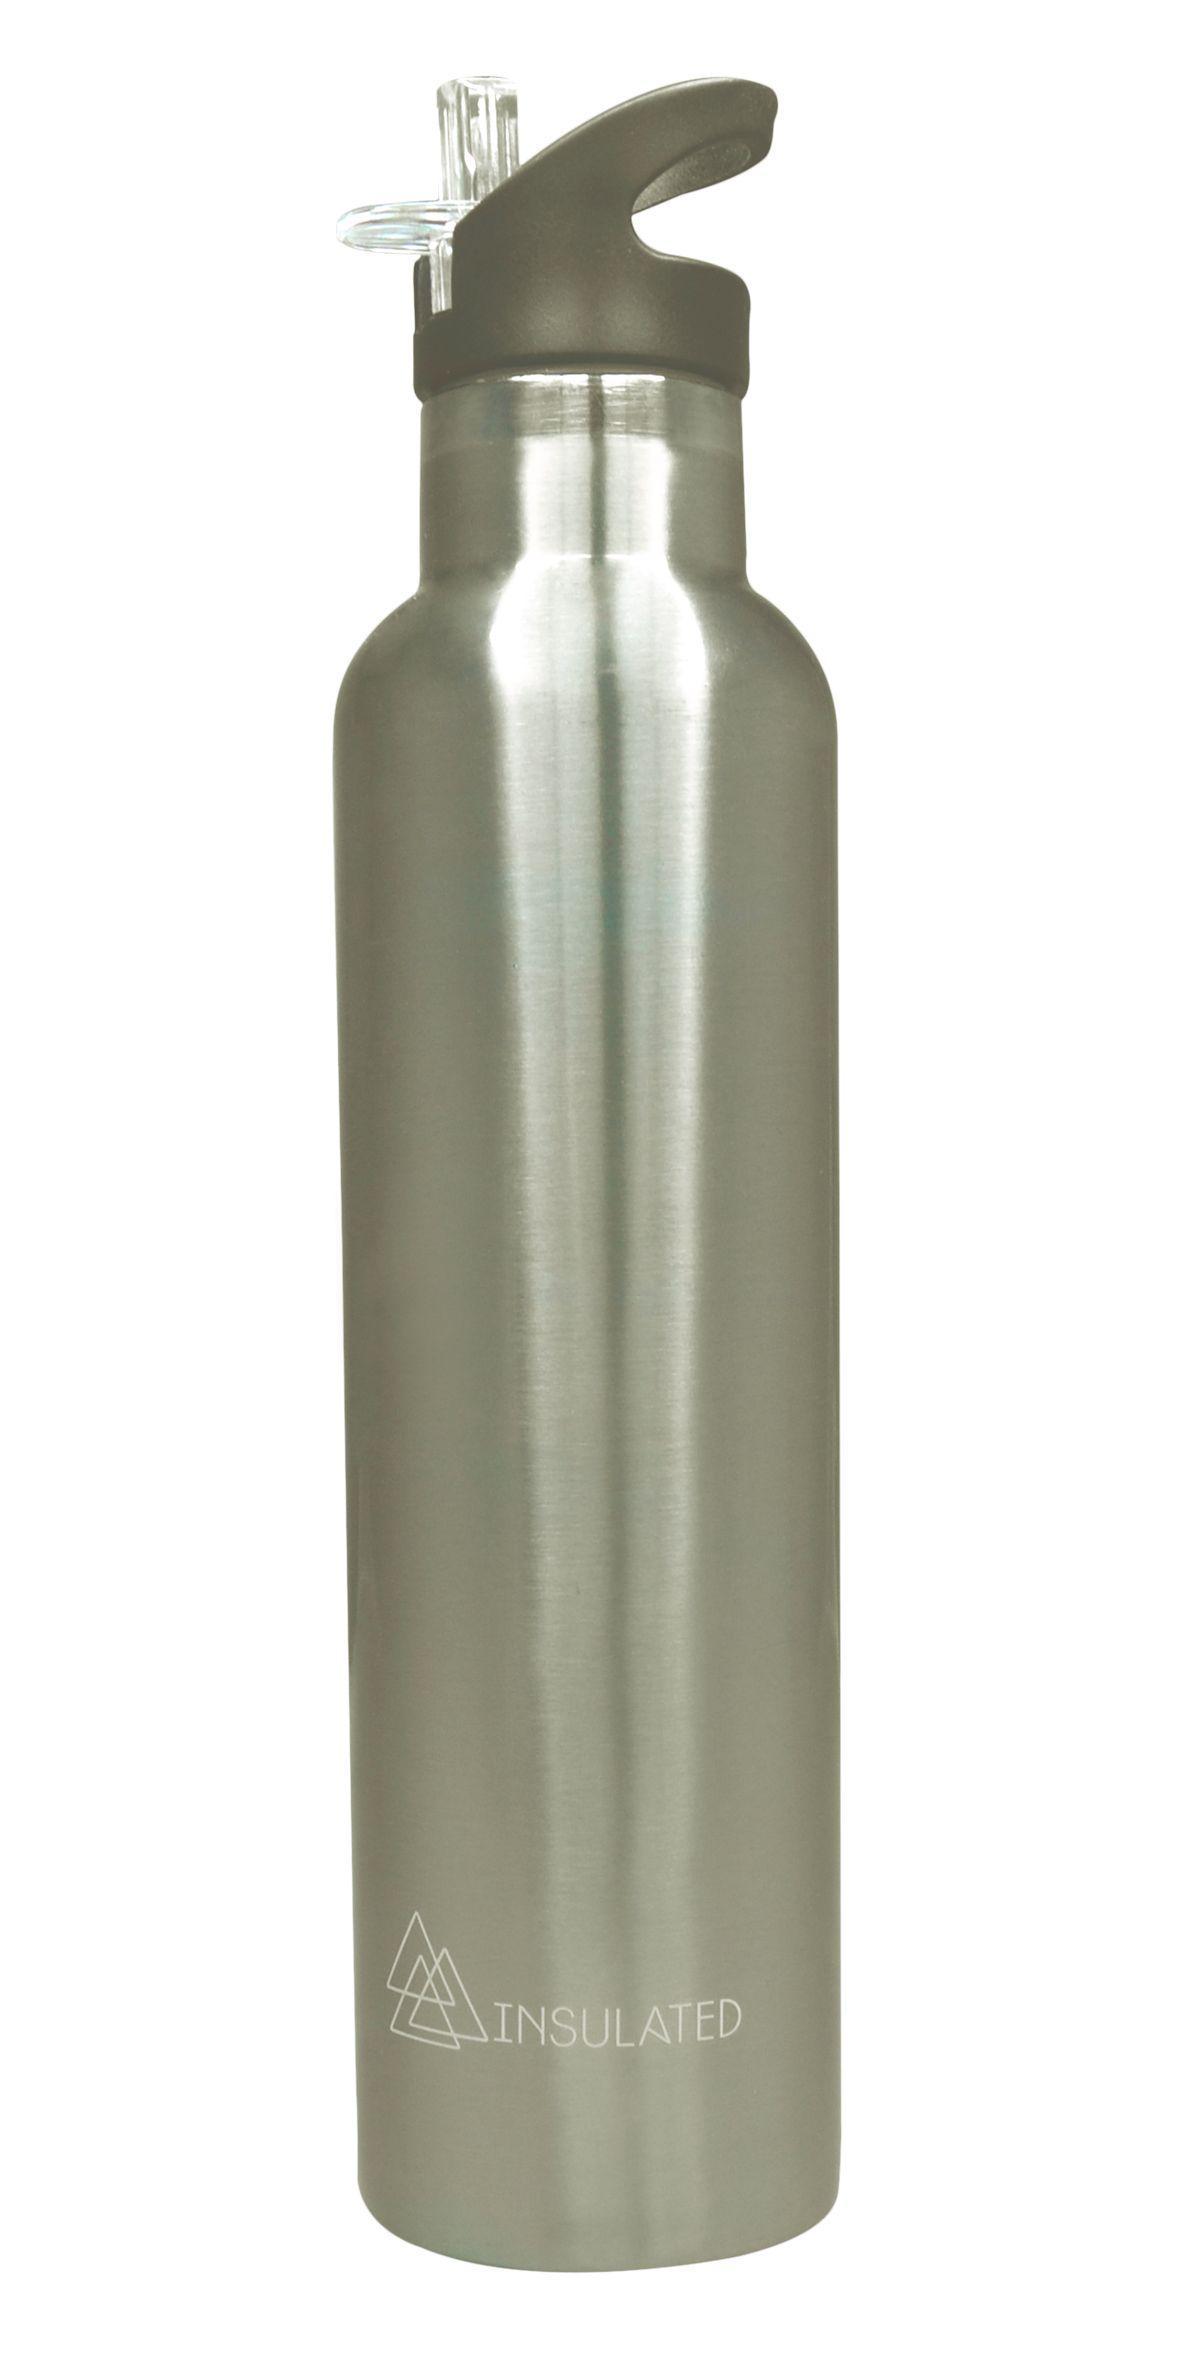 Stainless steel straw bottle